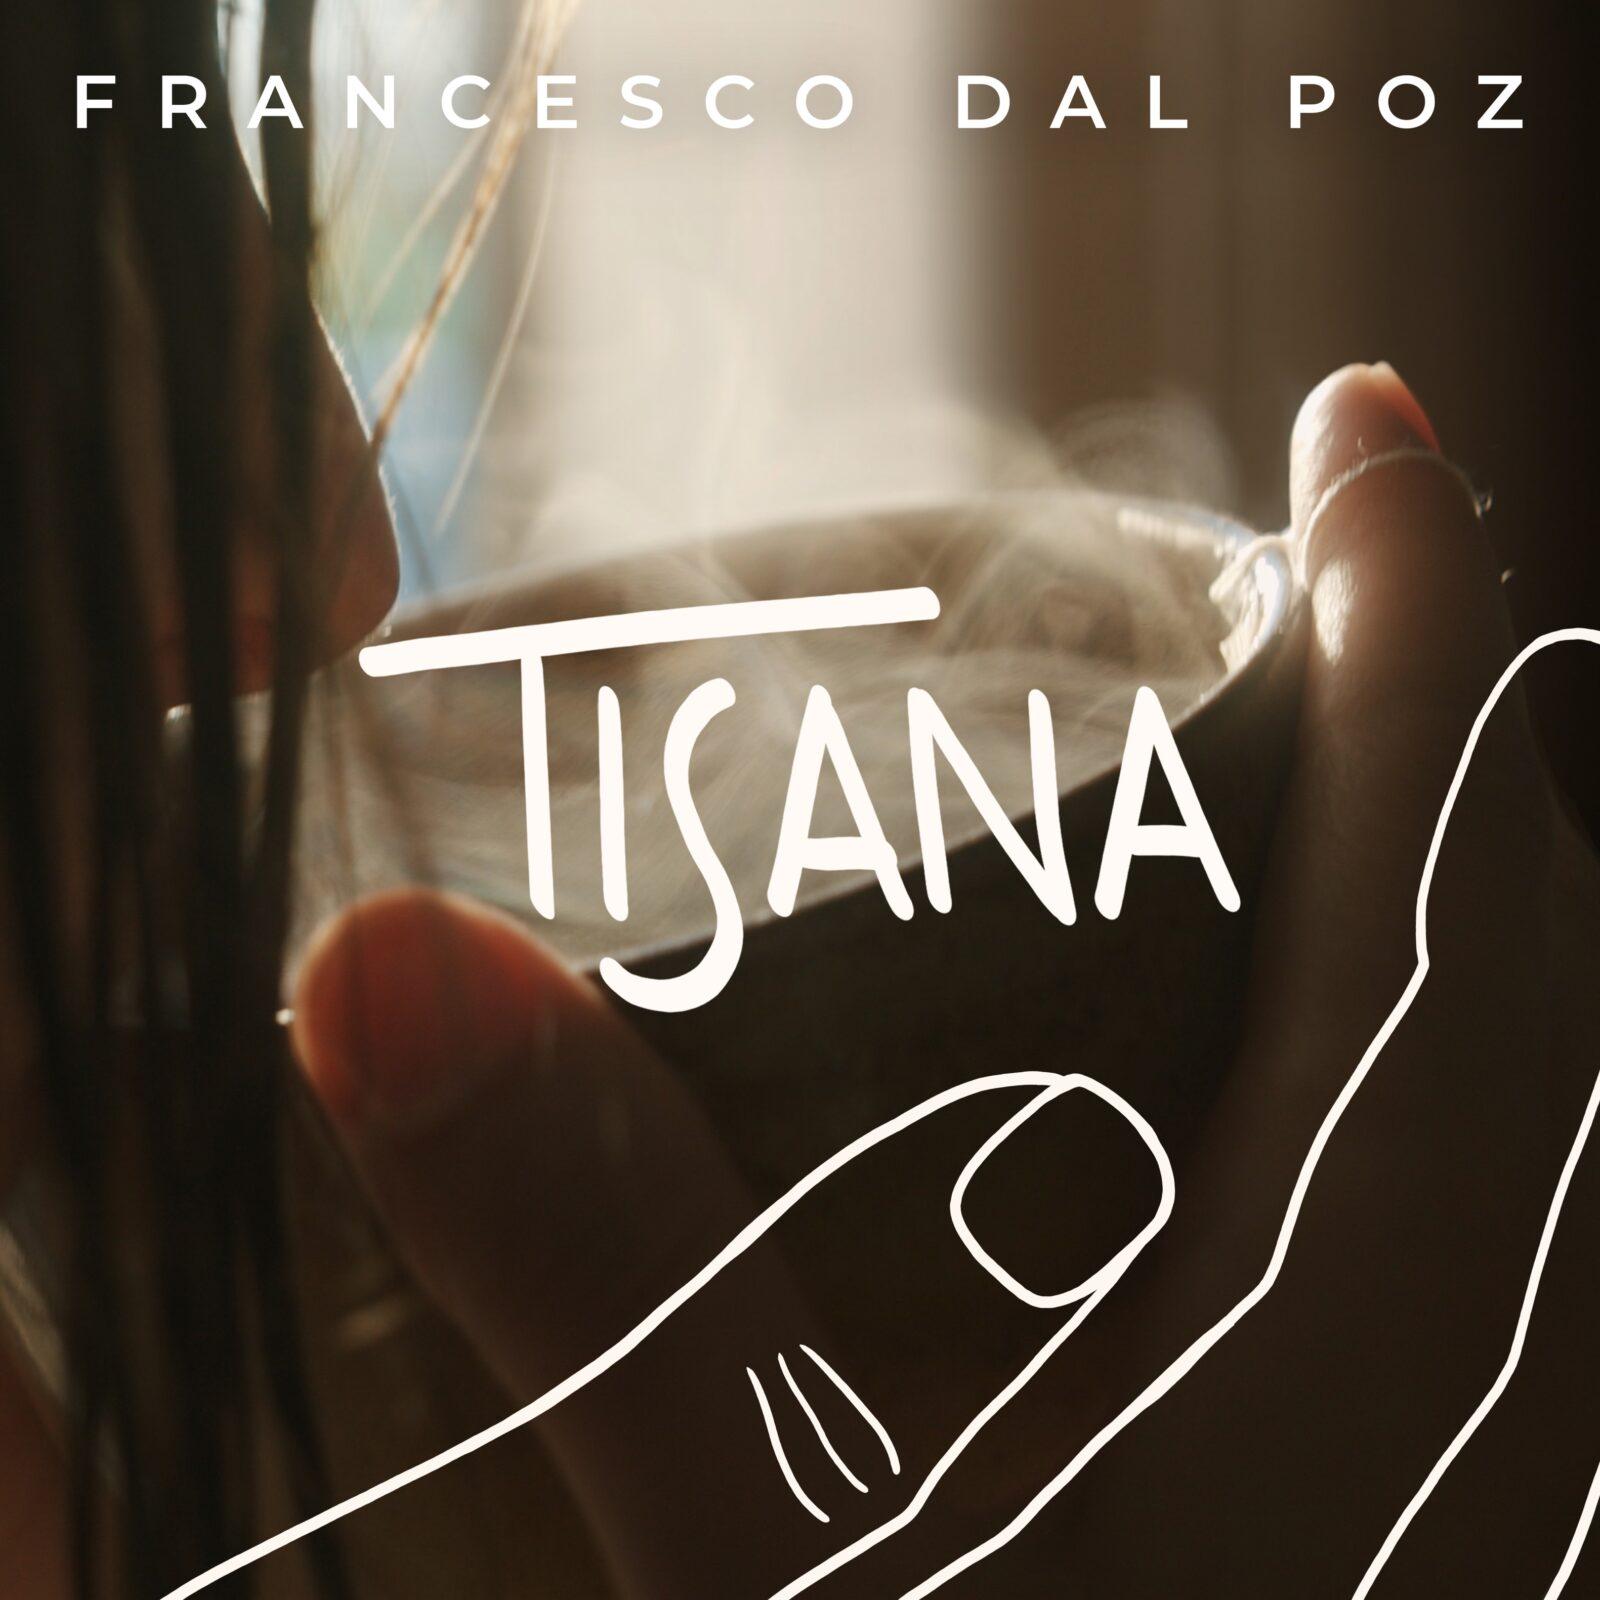 francesco dal poz tisana